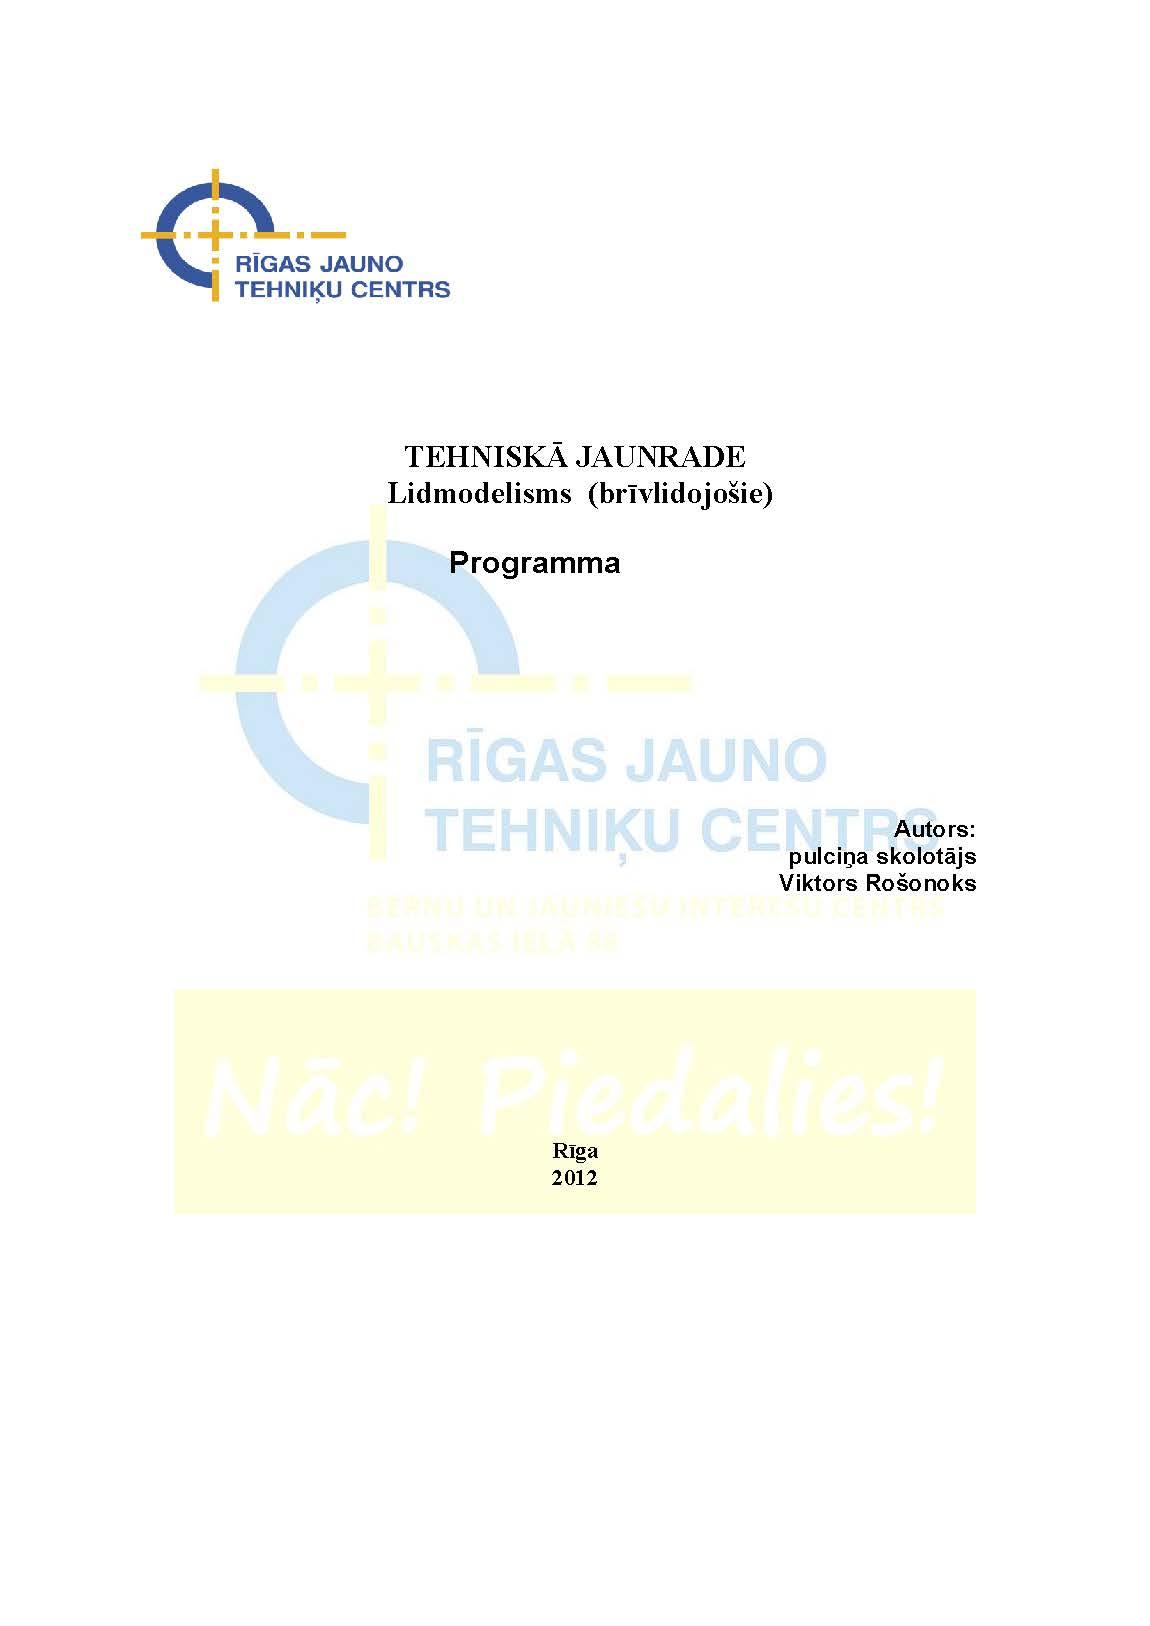 lidmodeluprogramma-1